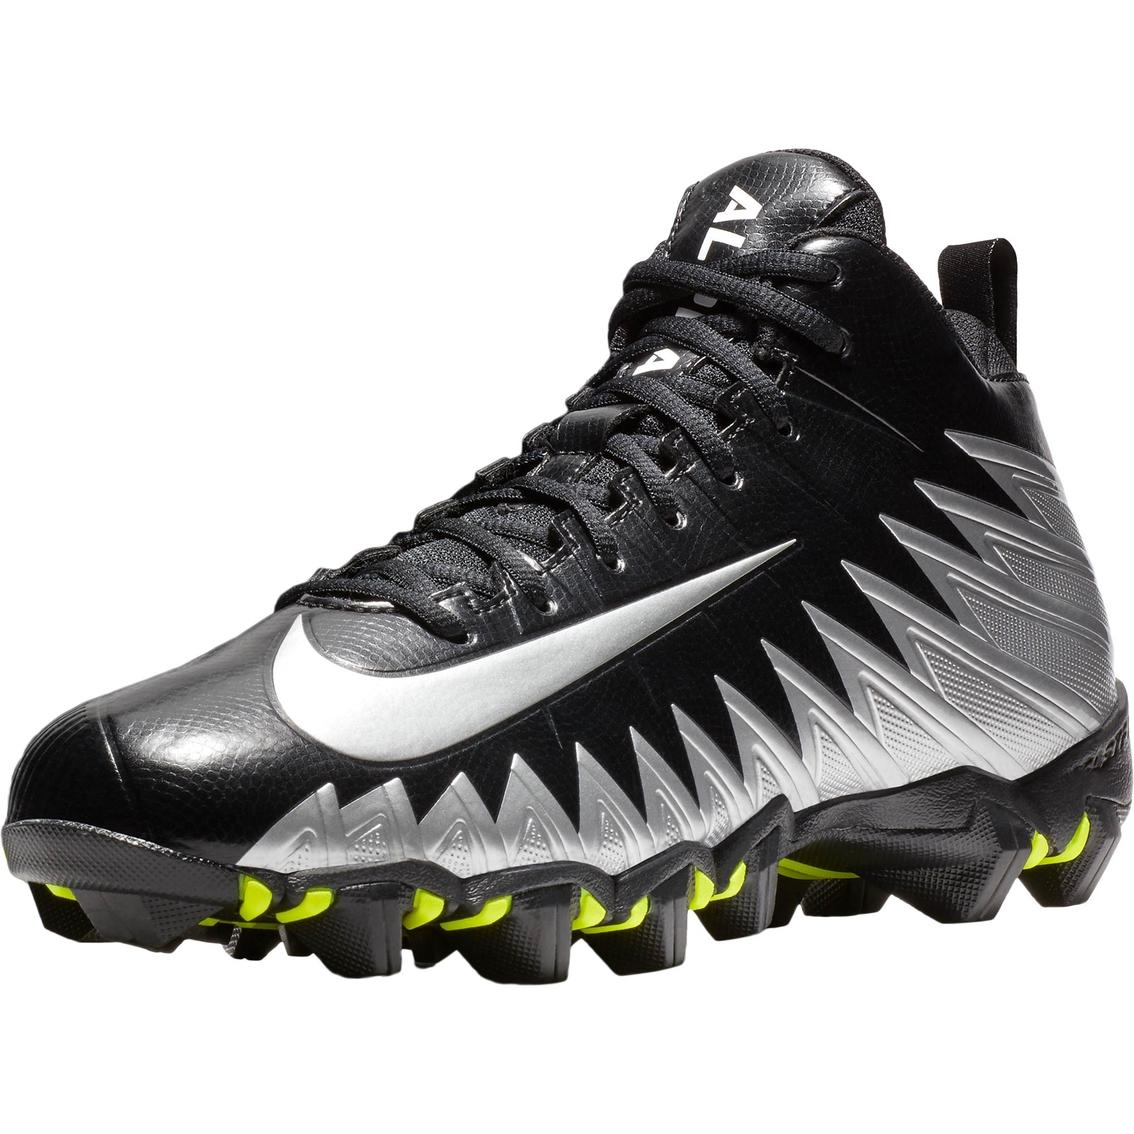 2b98cce44088 Nike Men's Alpha Menace Shark Football Cleats | Football | Shoes ...